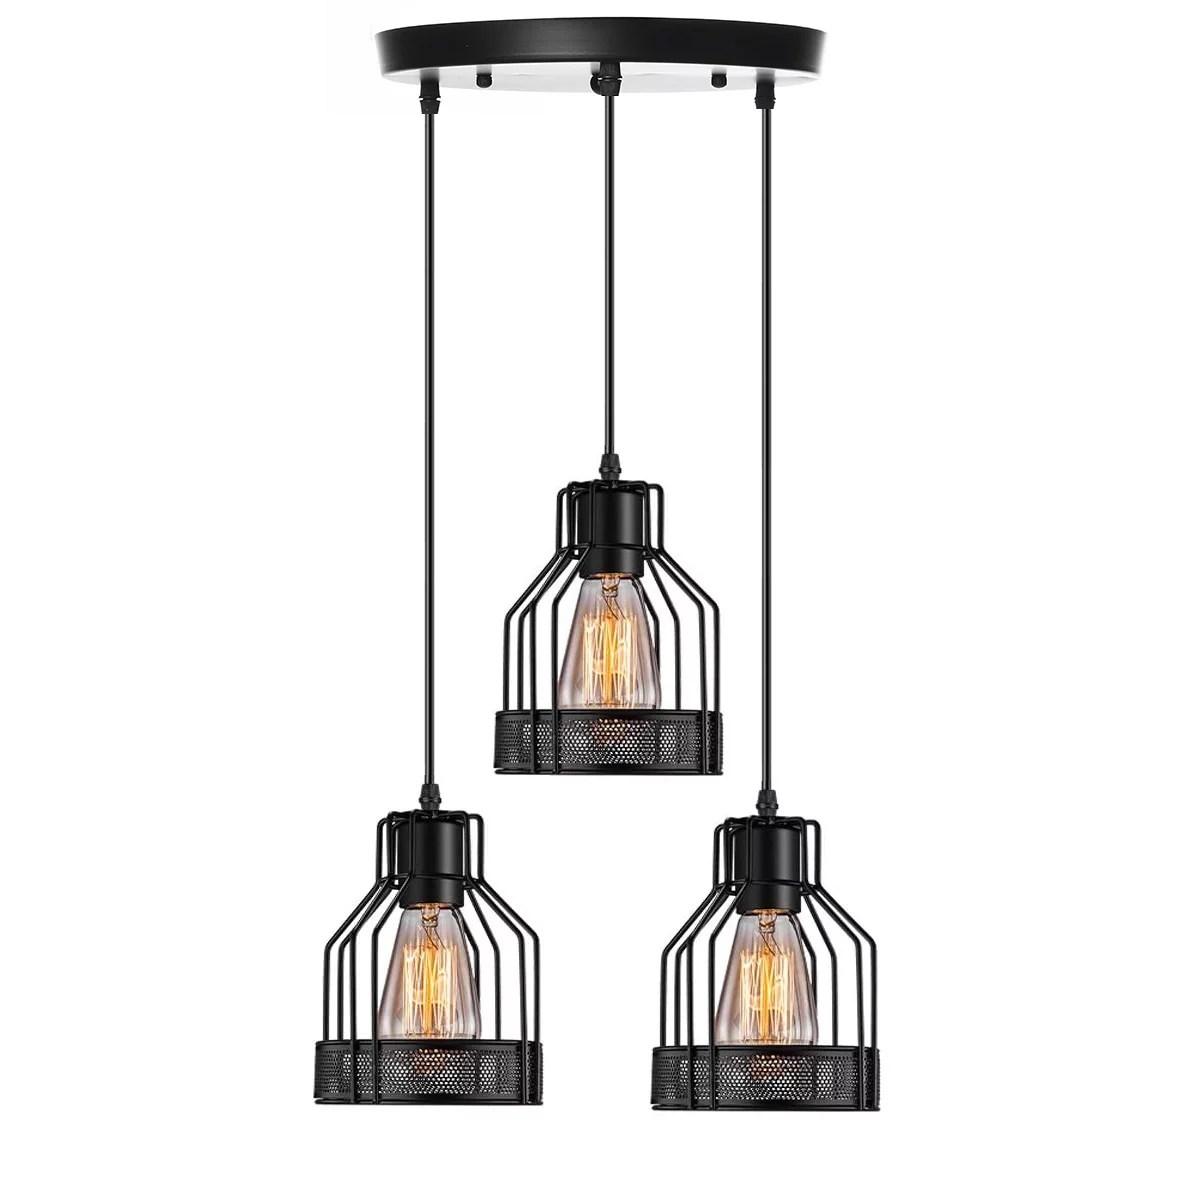 industrial pendant lighting e27 base edison metal caged vintage hanging pendant 3 lights rustic pendant light fixture for kitchen dining room bar